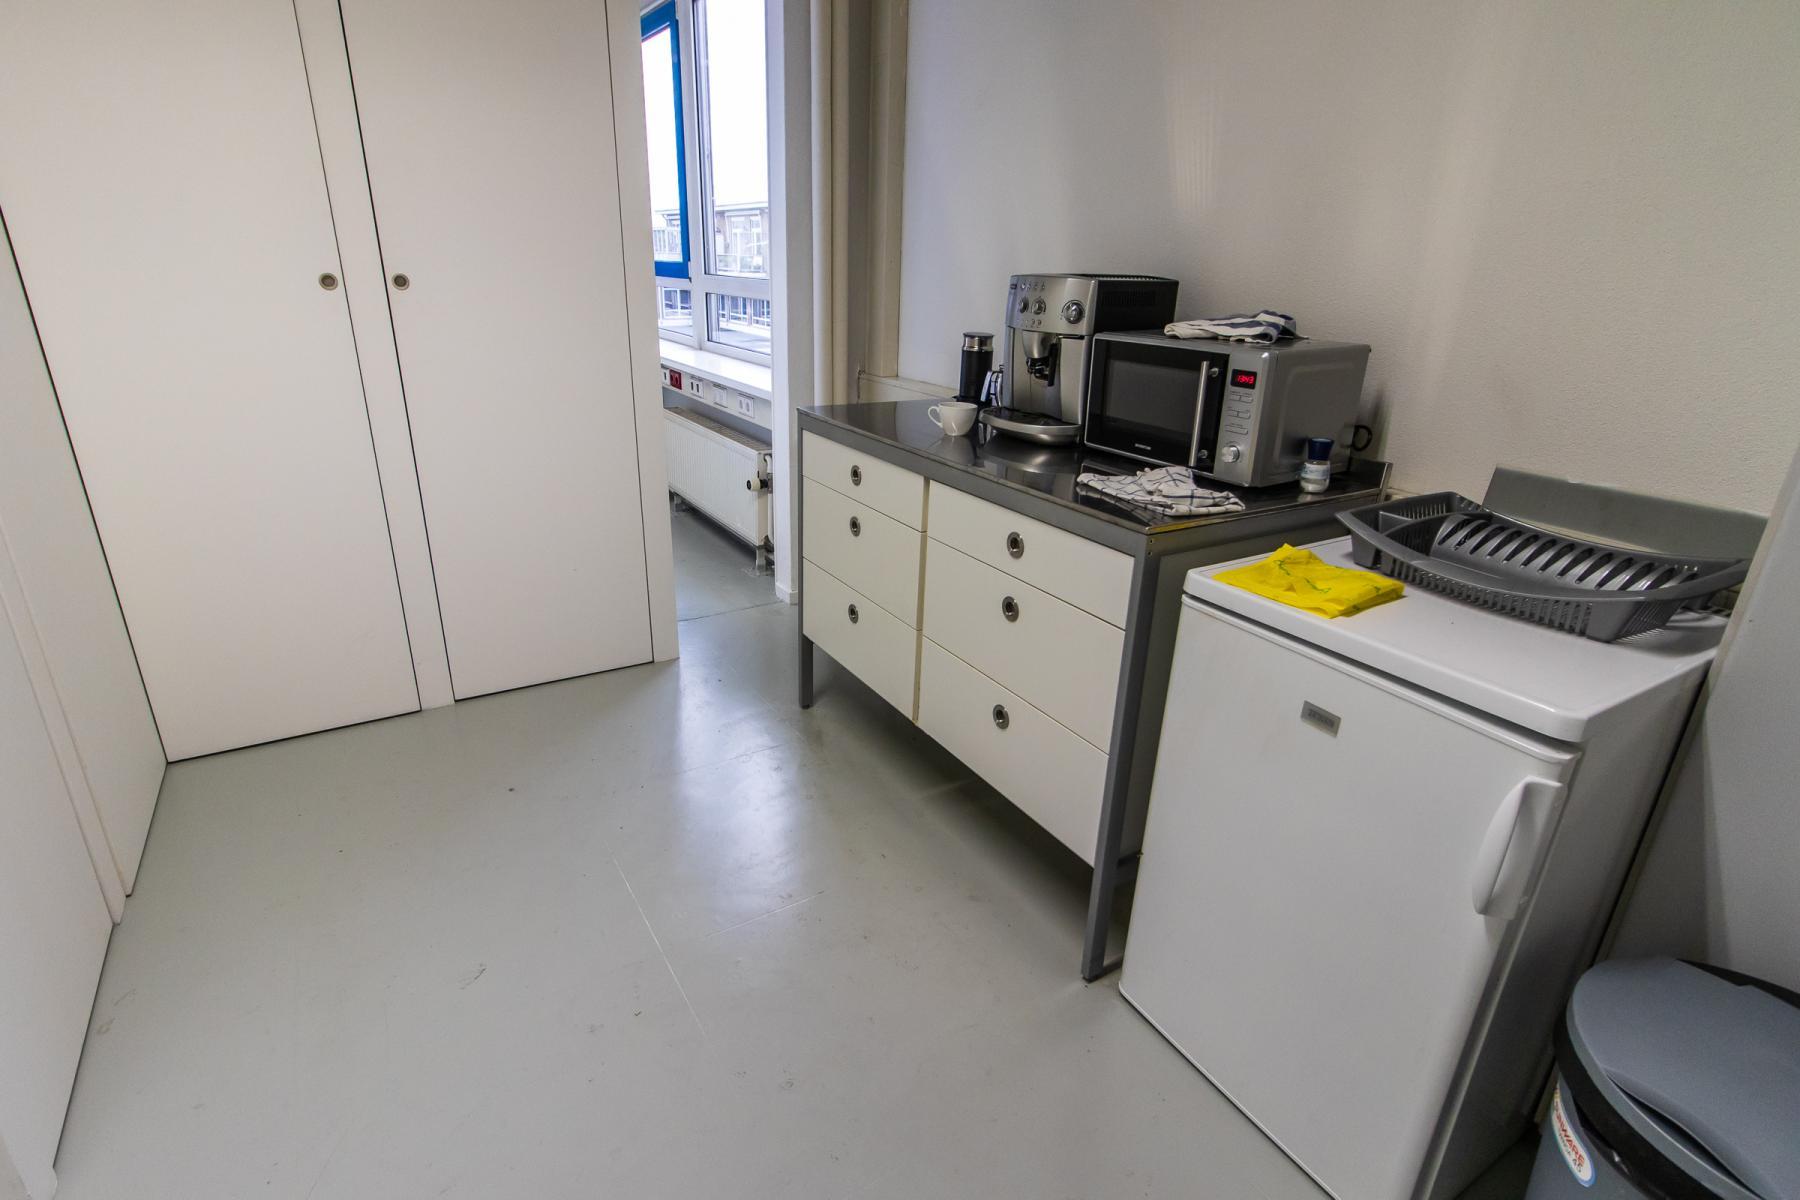 Rent office space Nieuwpoortkade 2a, Amsterdam (9)